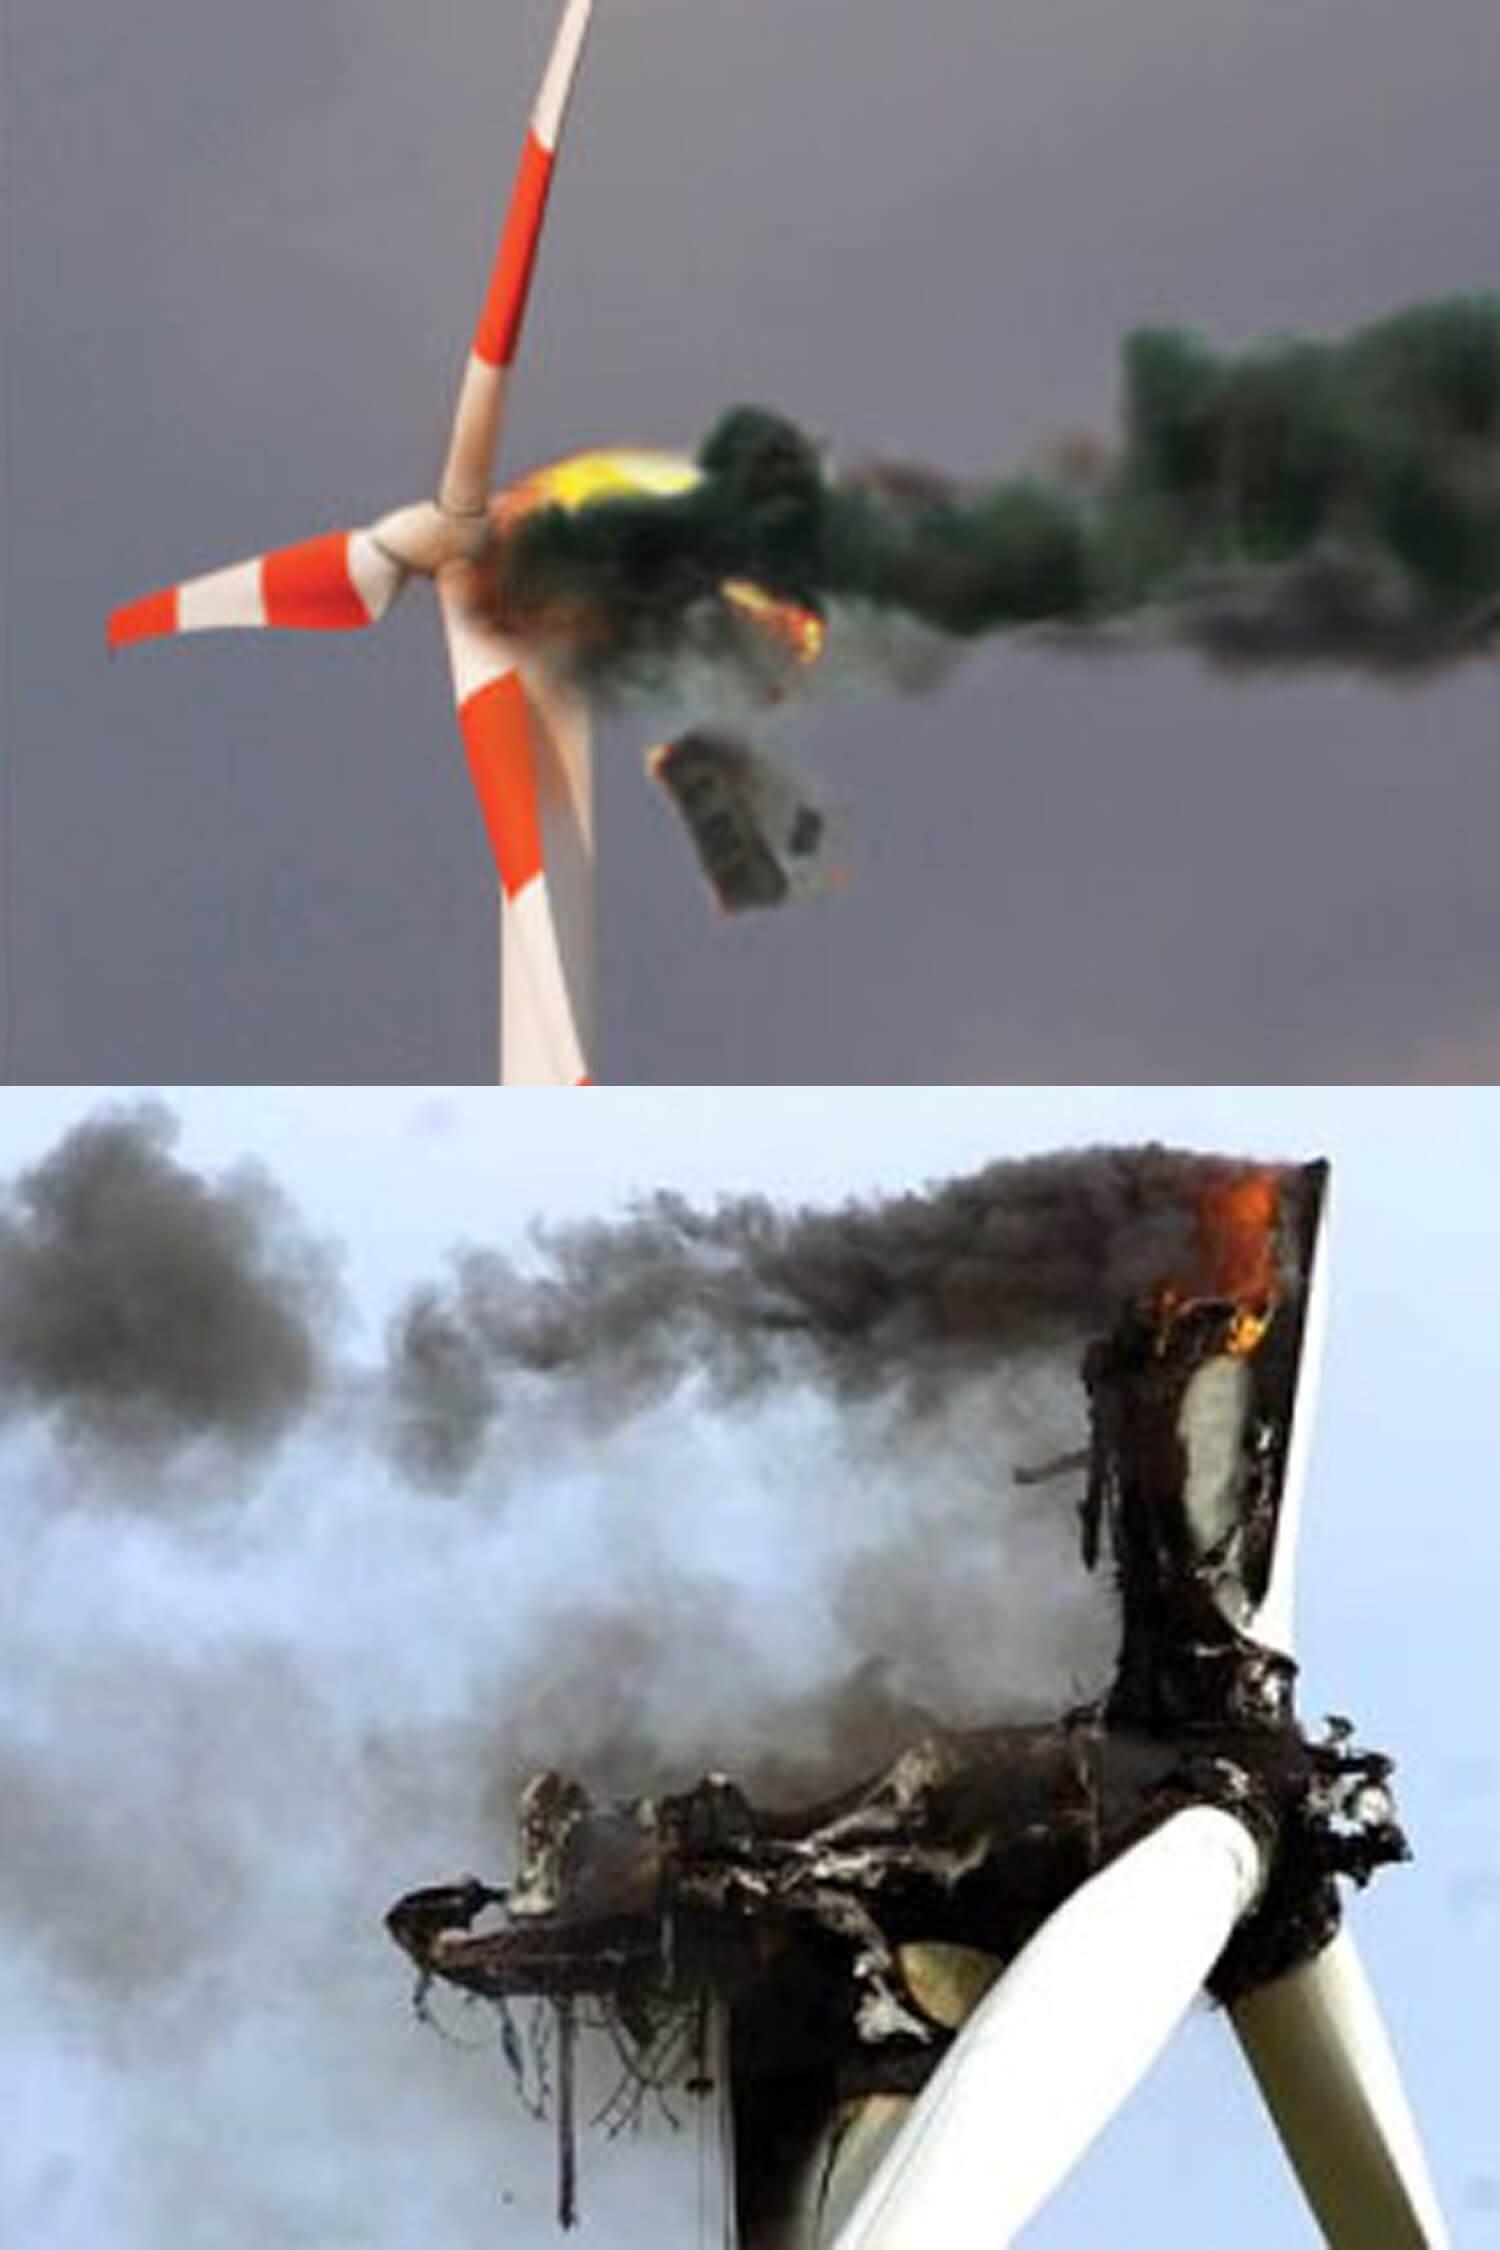 Wind Turbine / Generator Fire Suppression